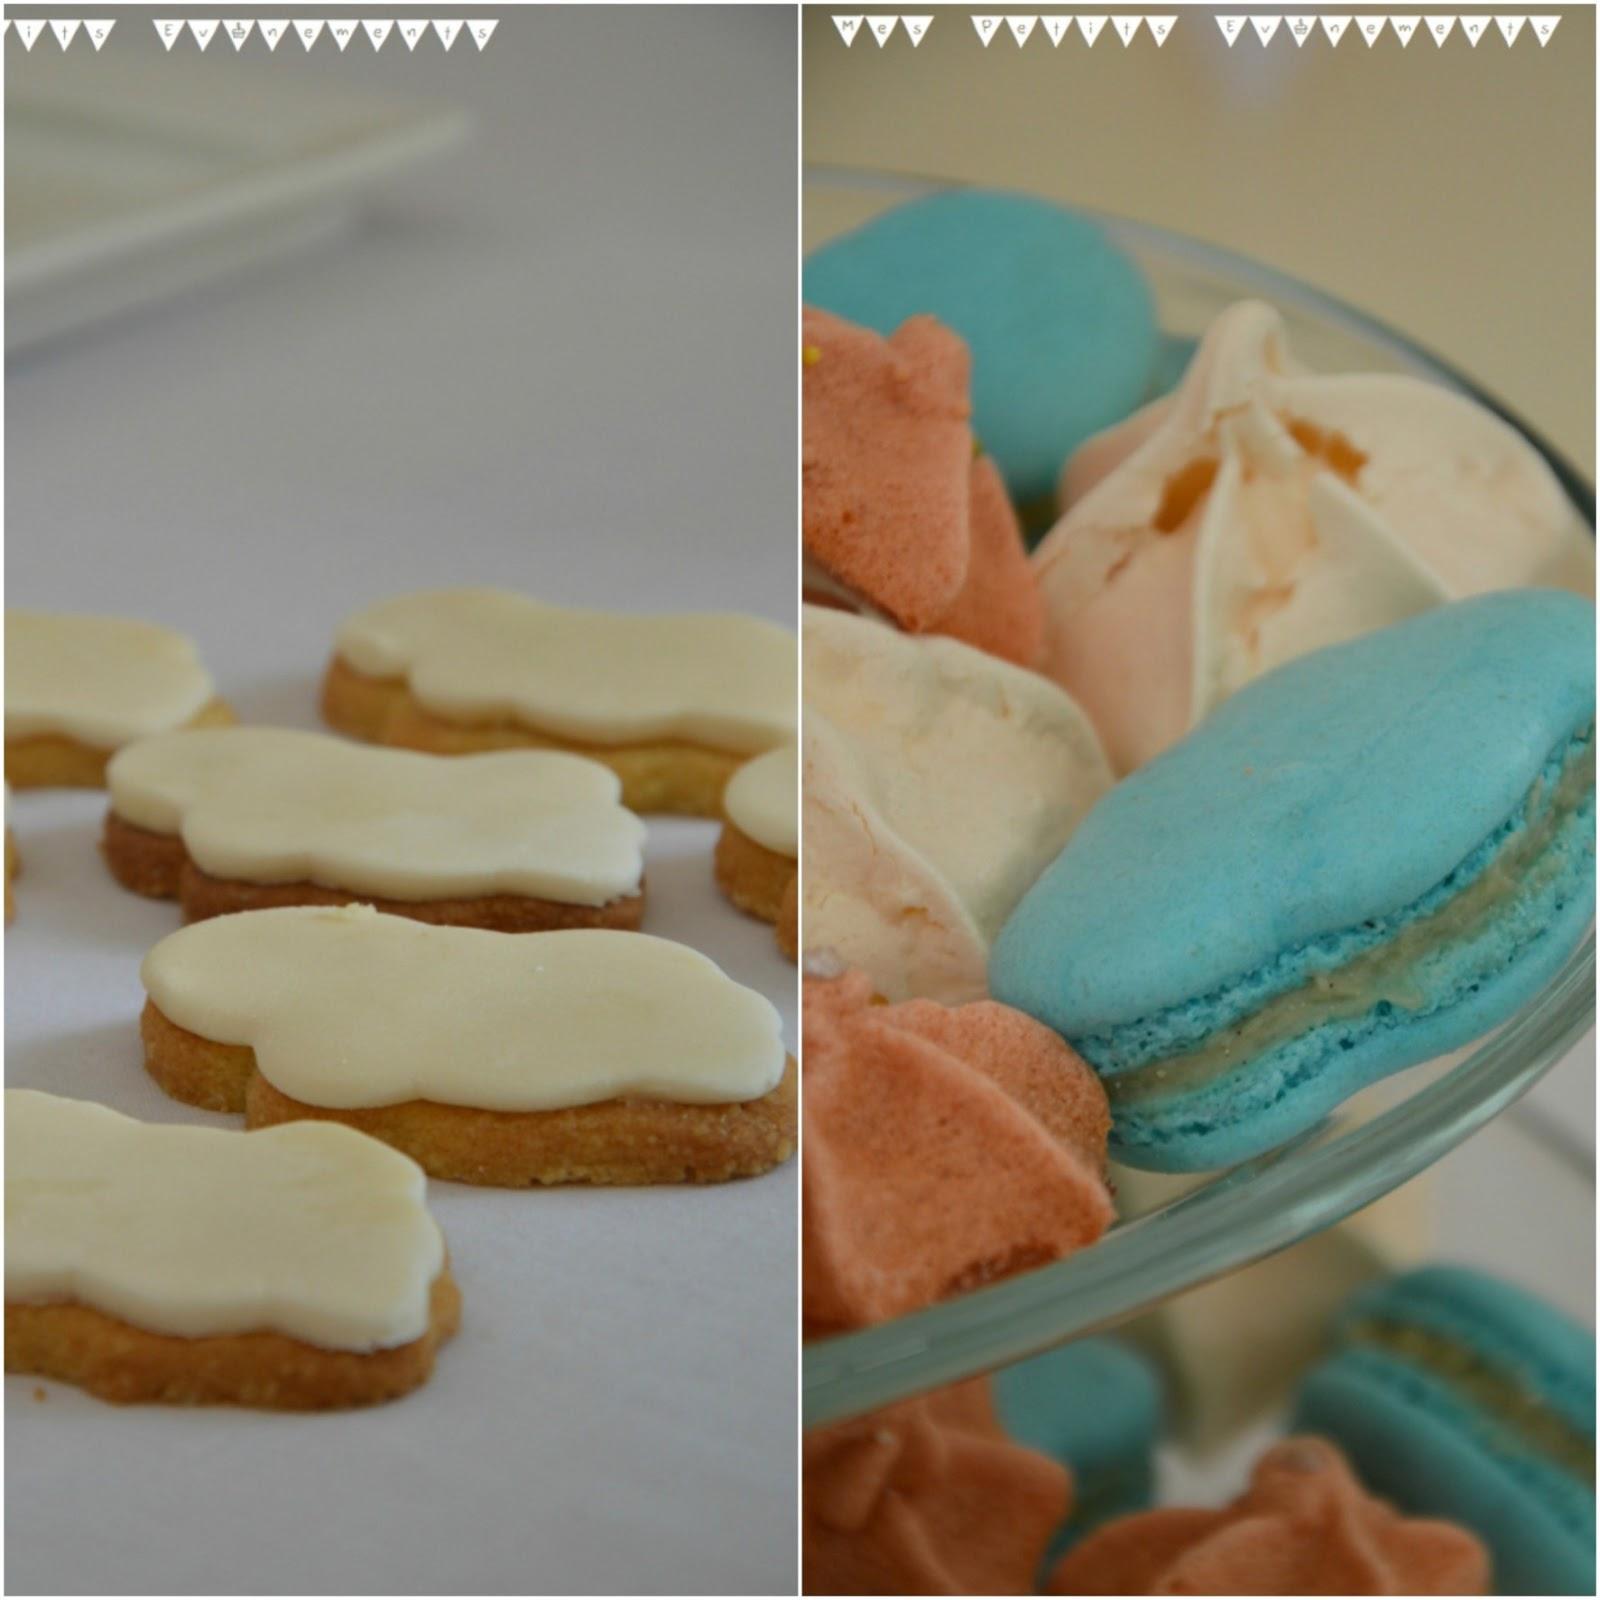 biscuit, meringue bleue et orange